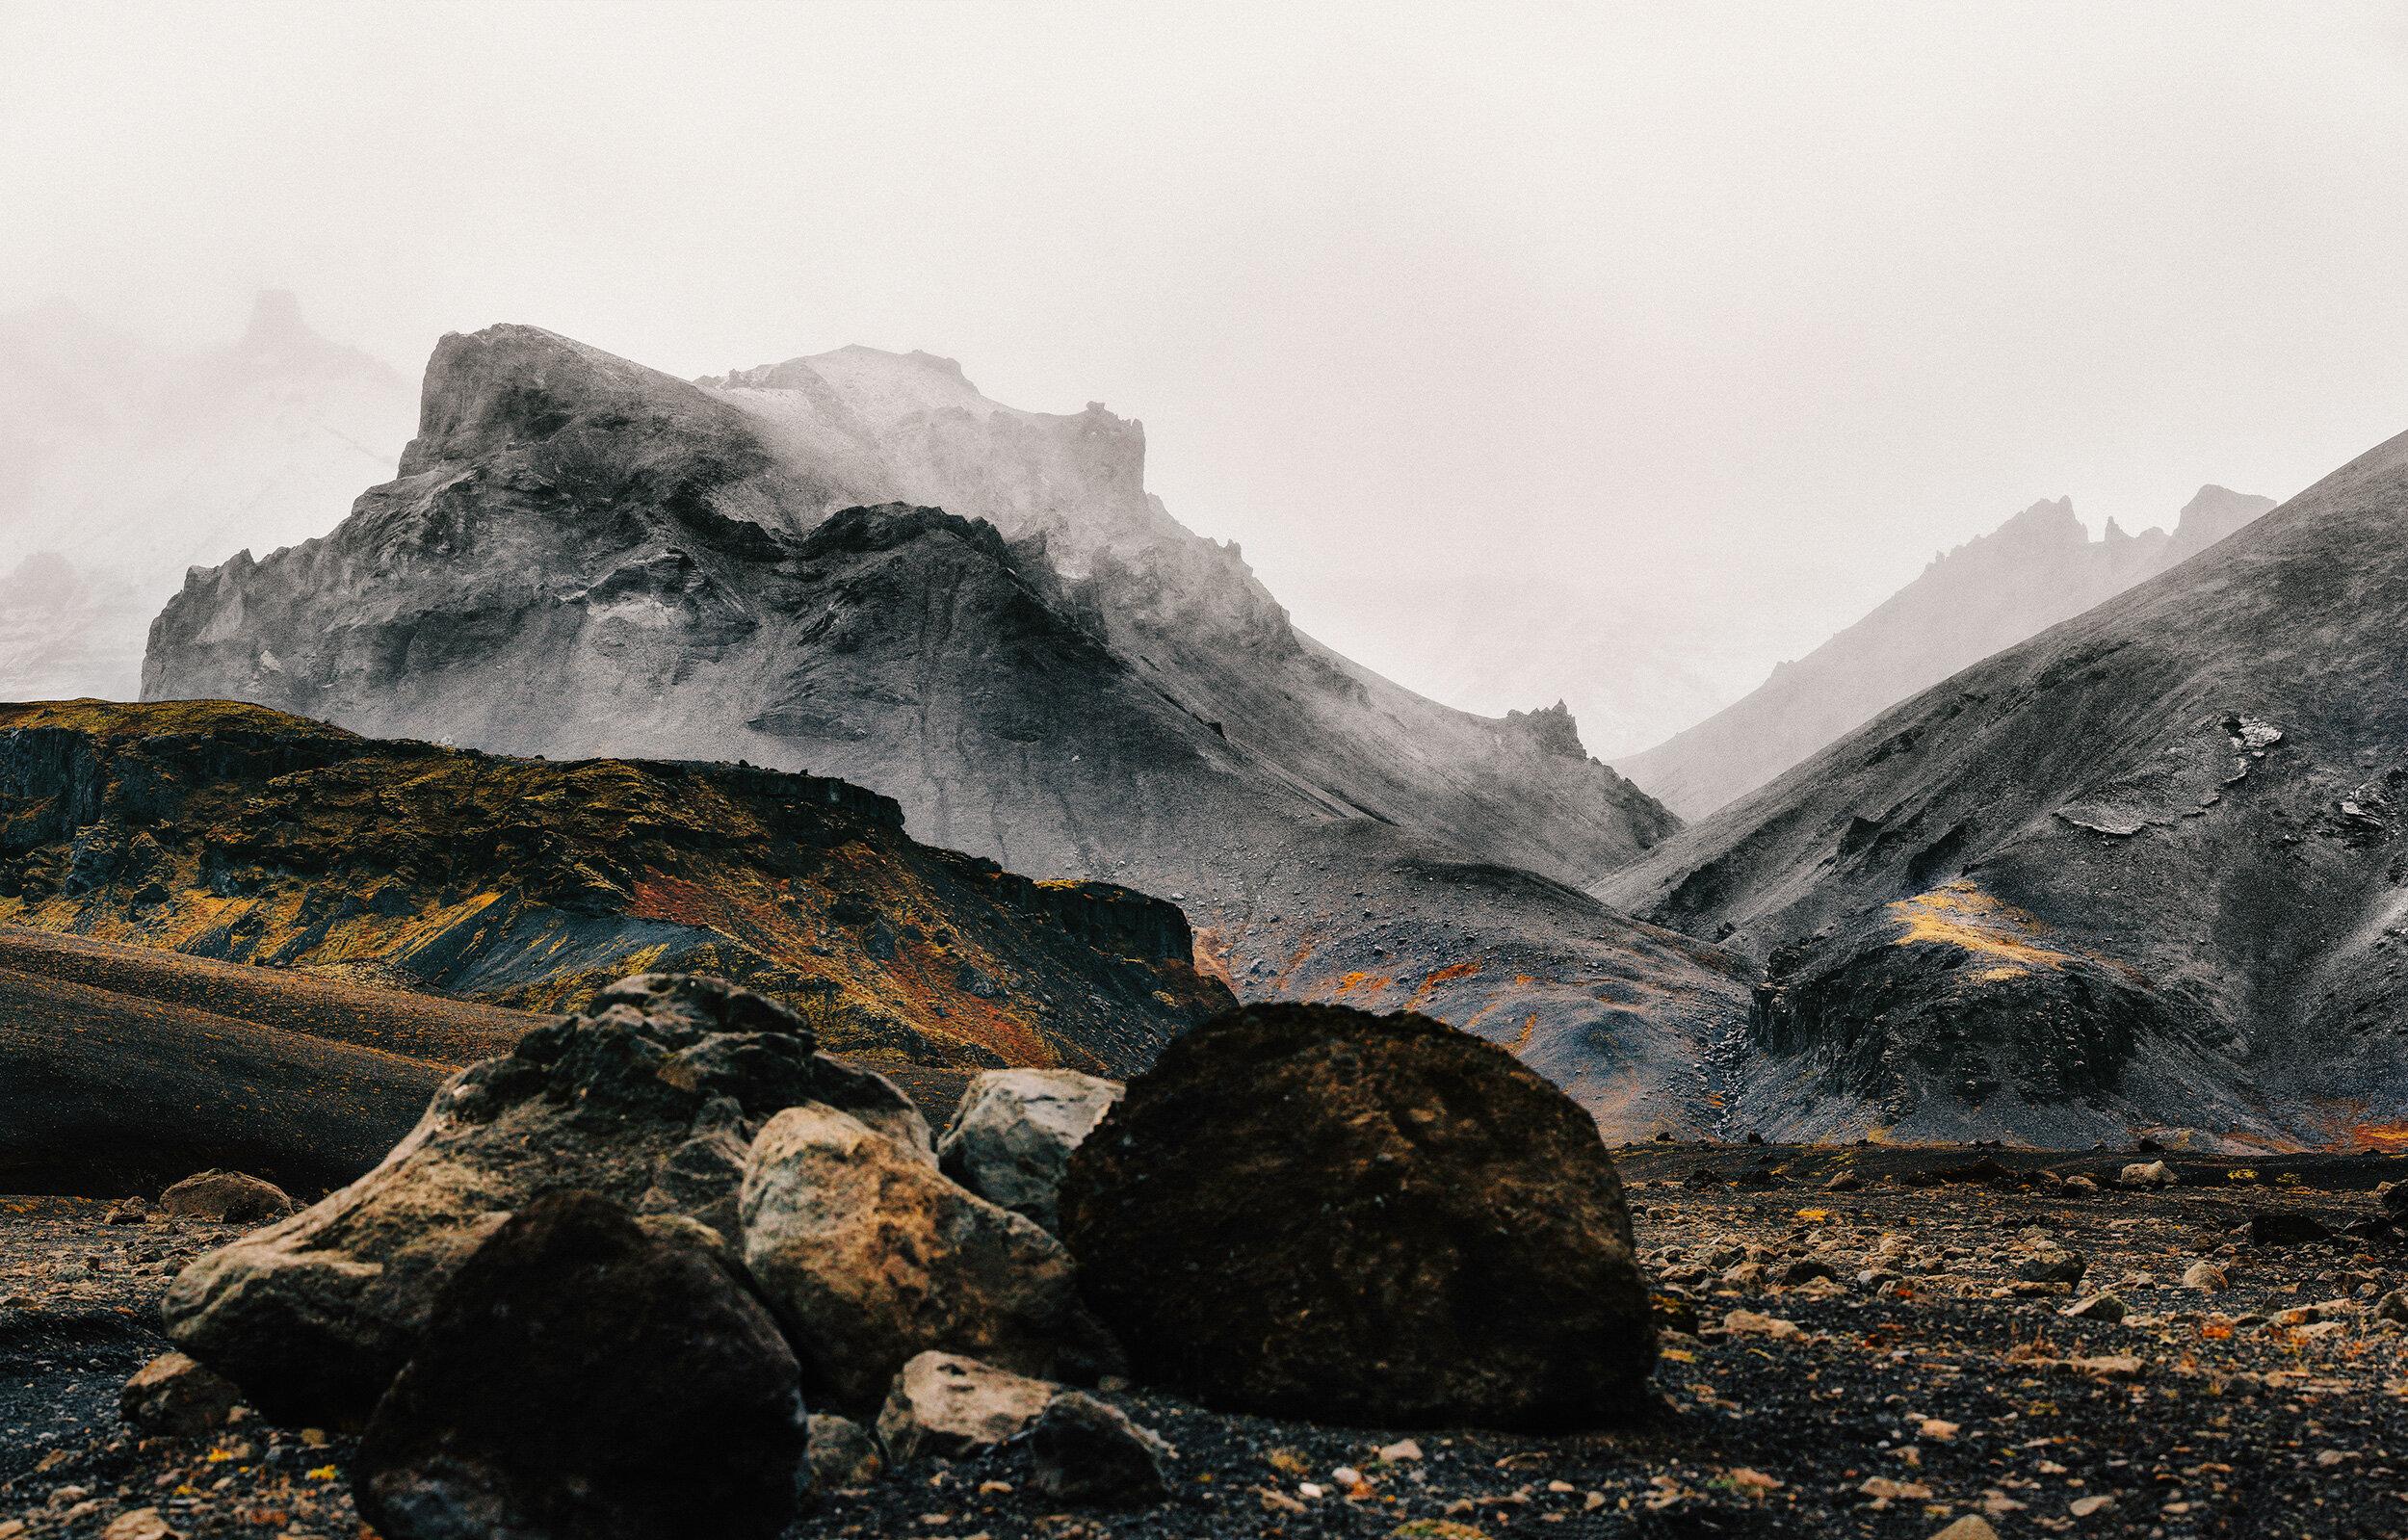 Mysterious volcanic landscape near Hof.